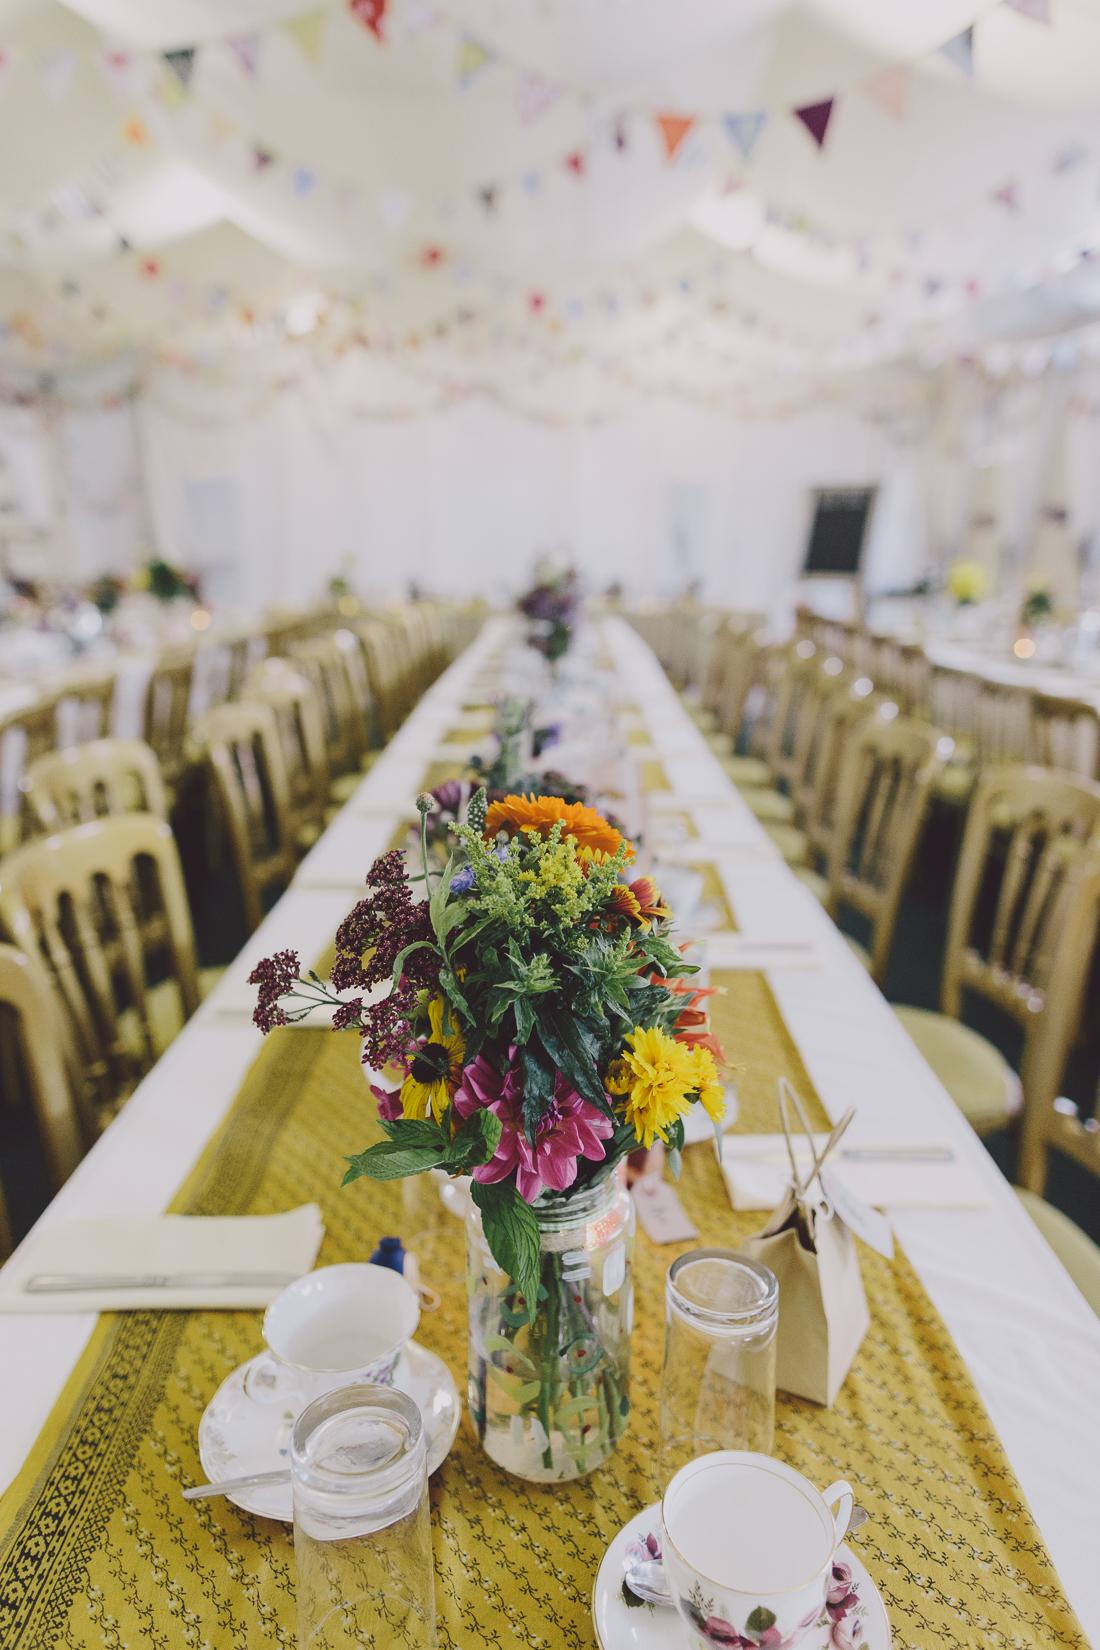 Flo + Ollie Tewkesbury Festival Wedding Scuffins Photography 067